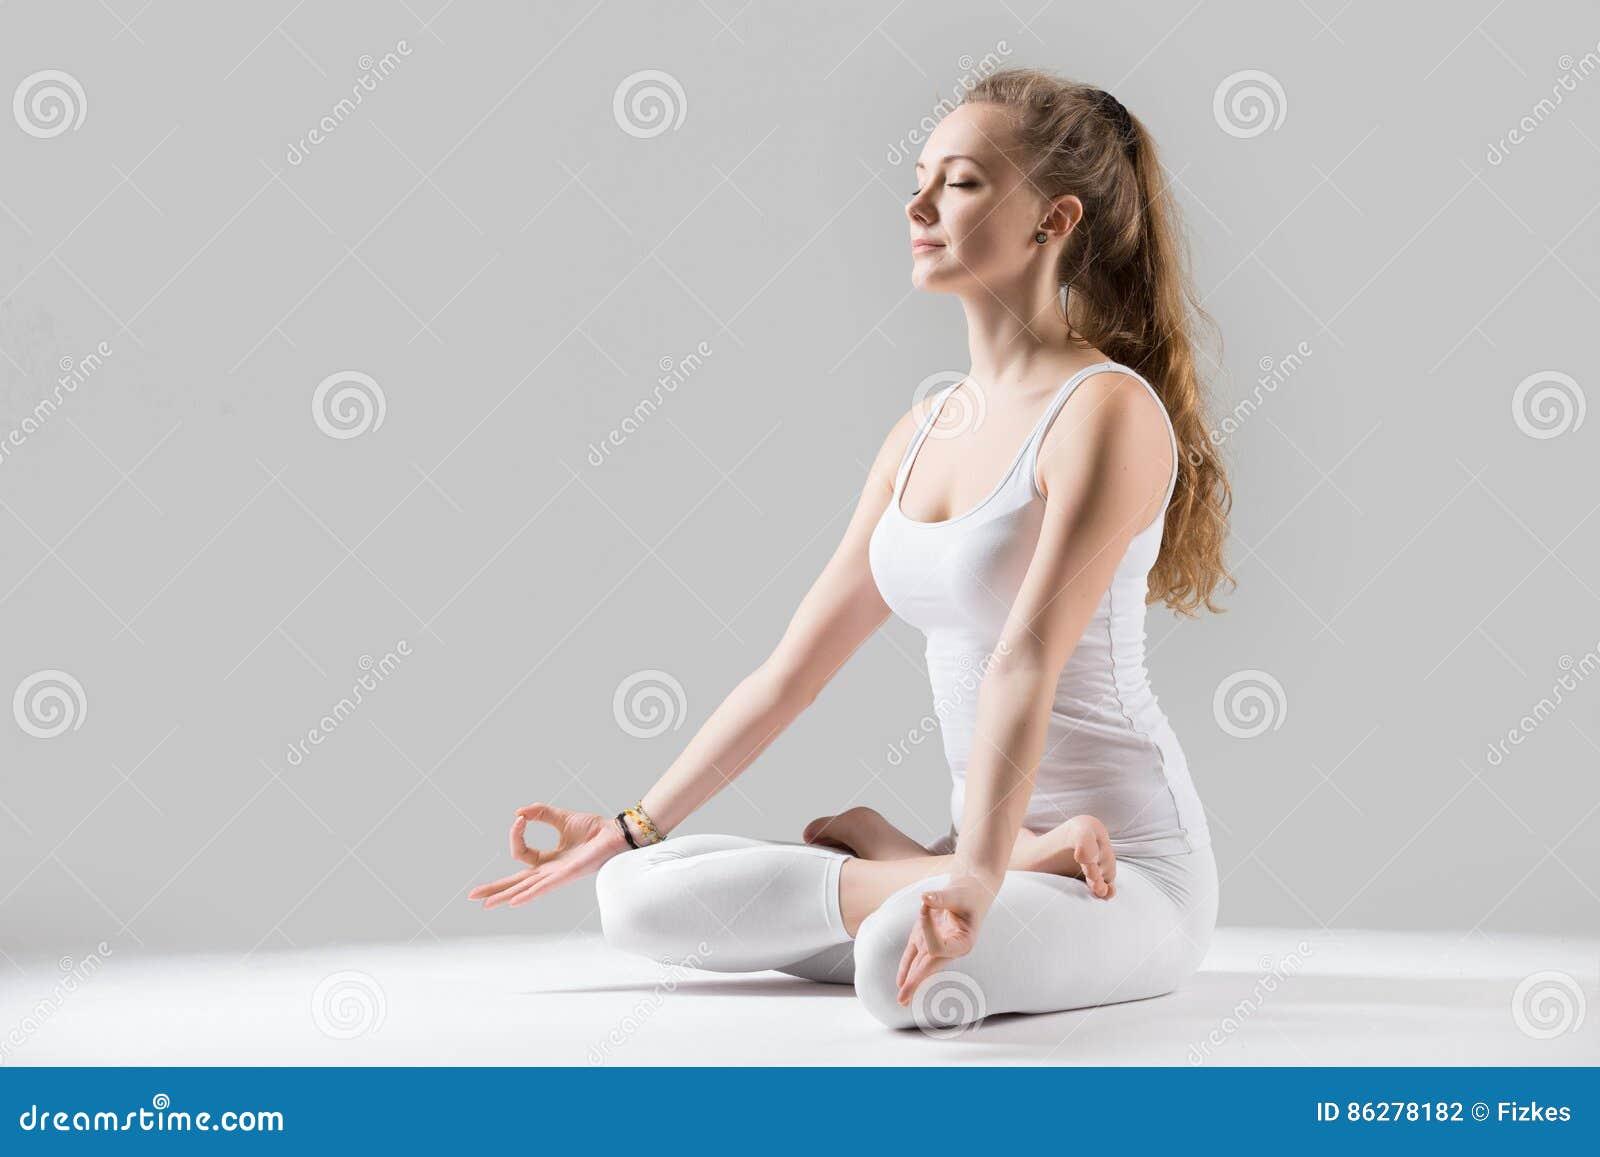 Young attractive woman in Padmasana pose with mudra, grey studio